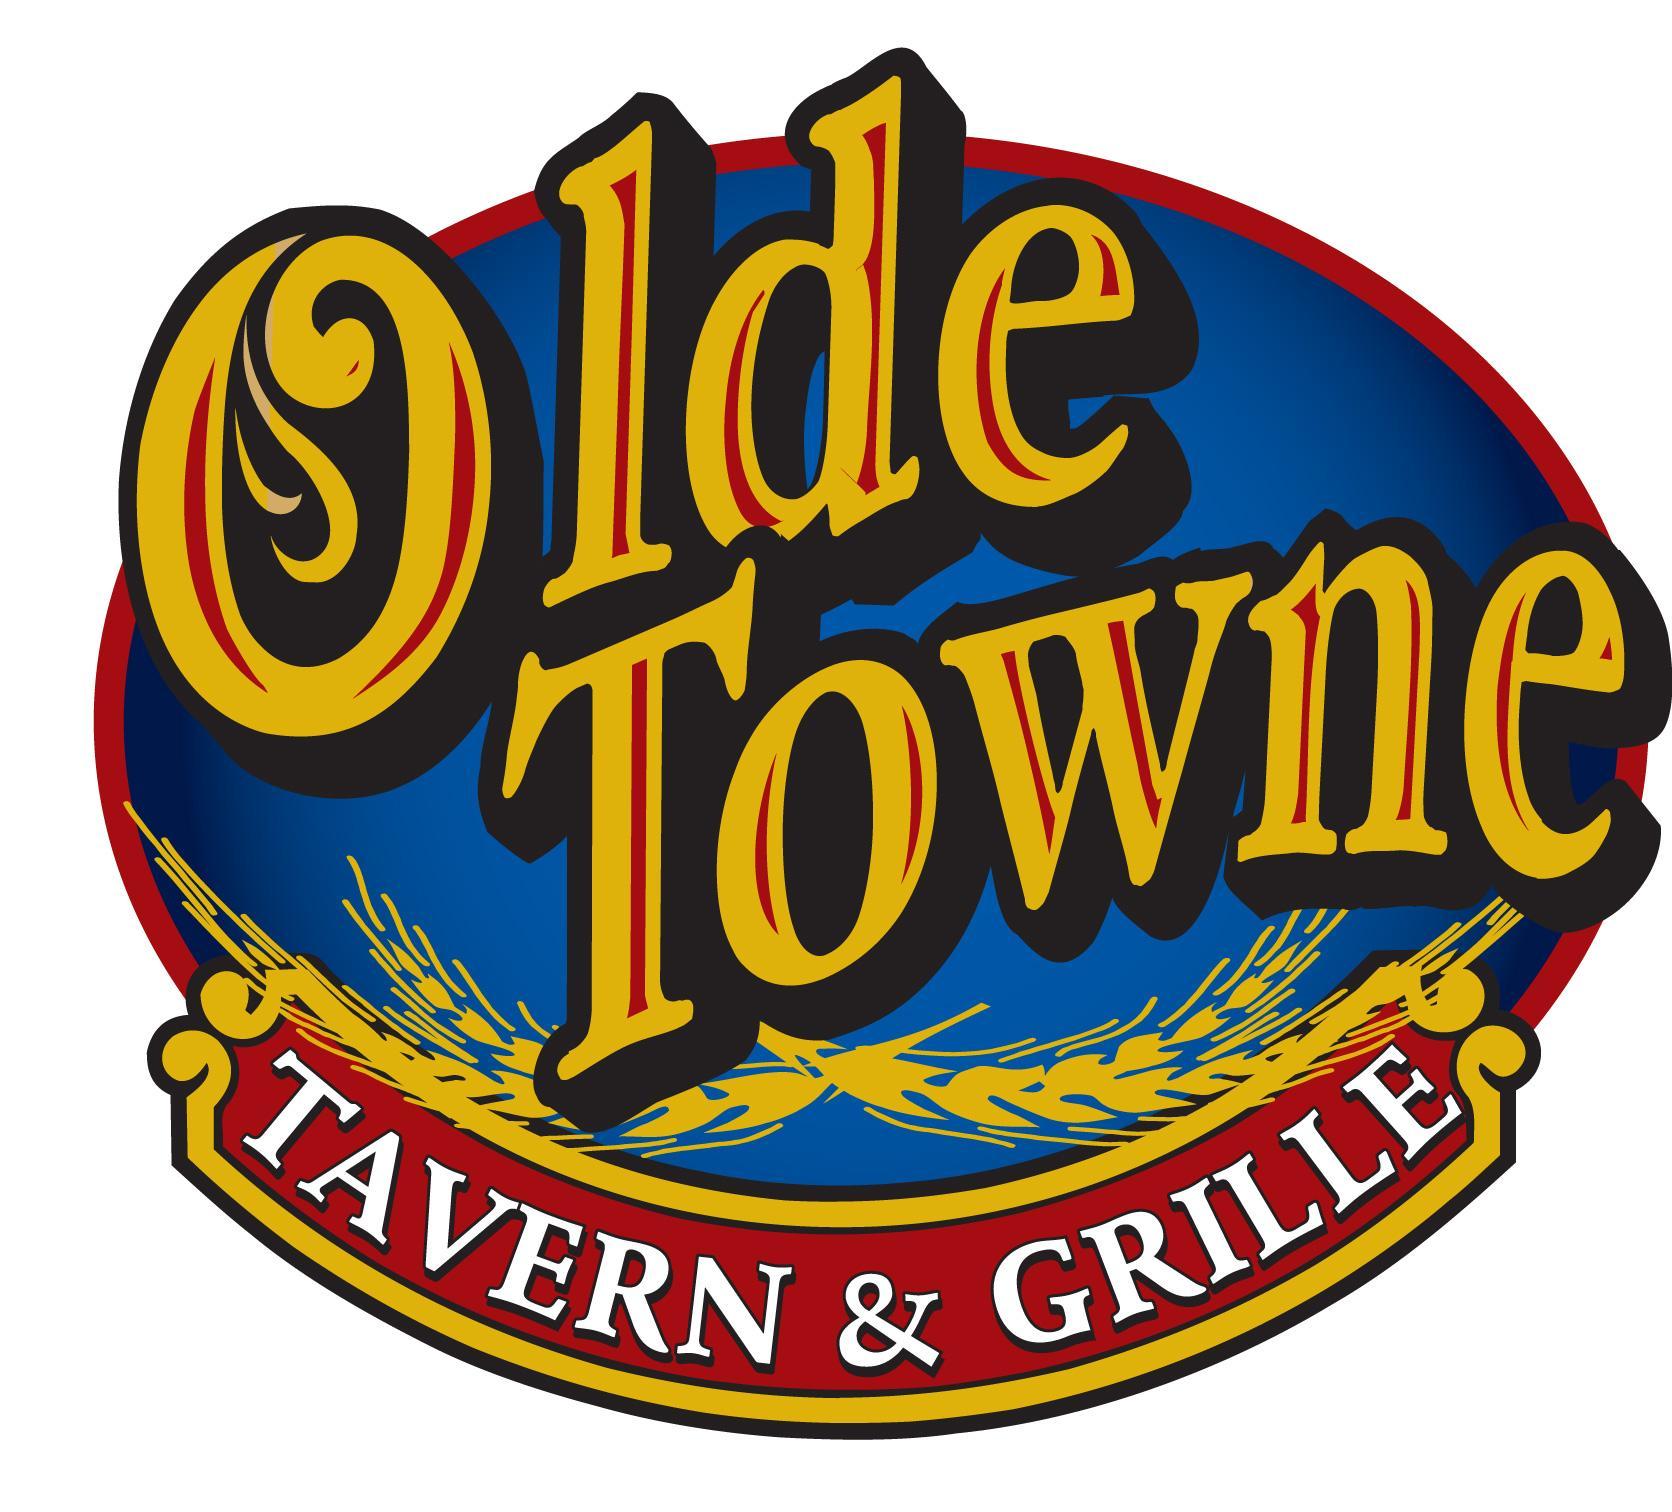 OLDE+TOWNE+LOGO.jpg